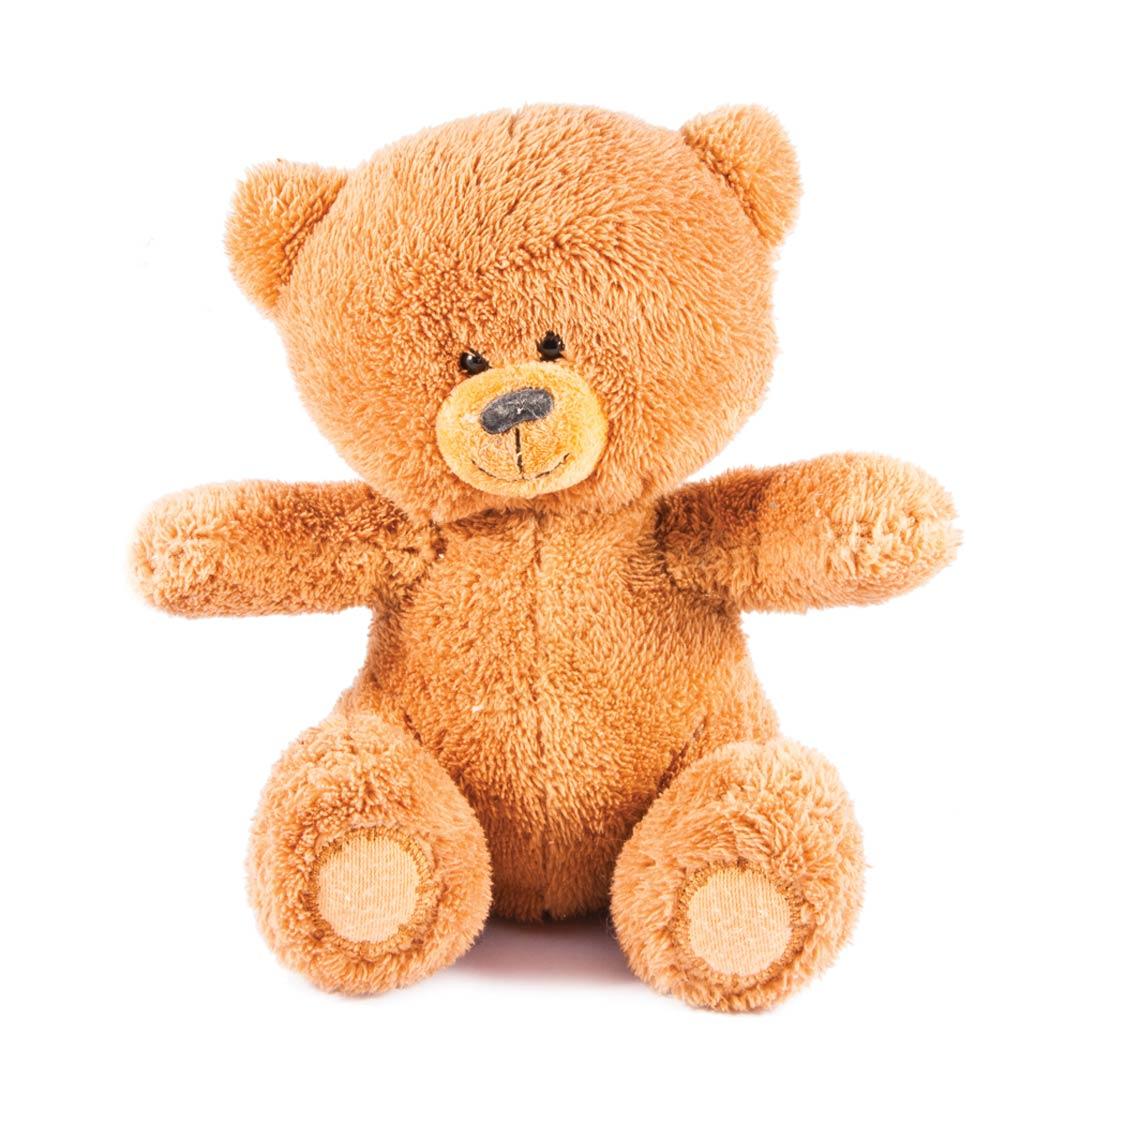 Toys Are Us Stuffed Animals : Stuffed animals zero waste box · terracycle